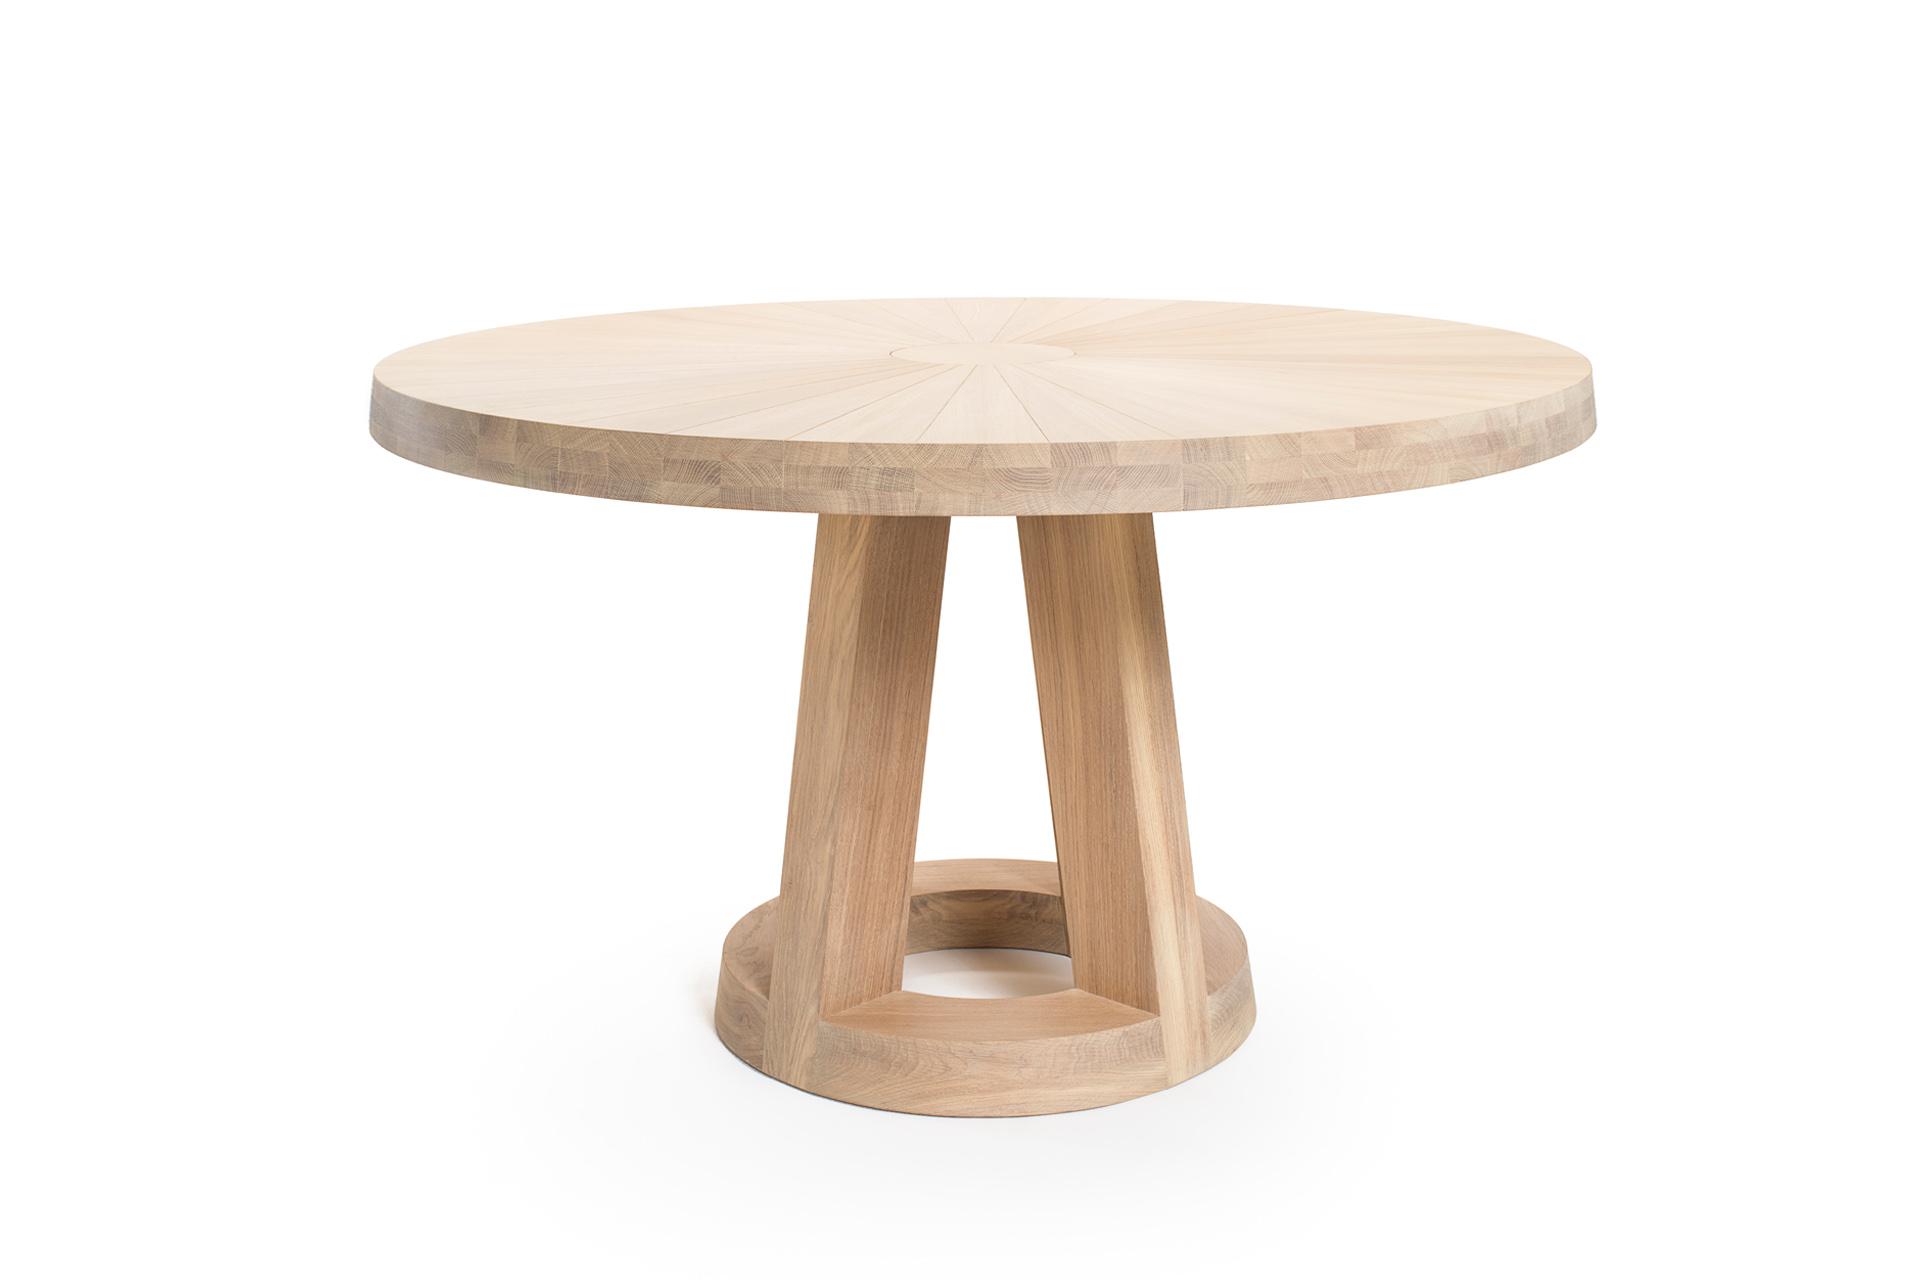 Ronde Eettafel 130 Cm Eiken.Solid Ronde Design Tafel L Remy Meijers L Odesi Your Dutch Design